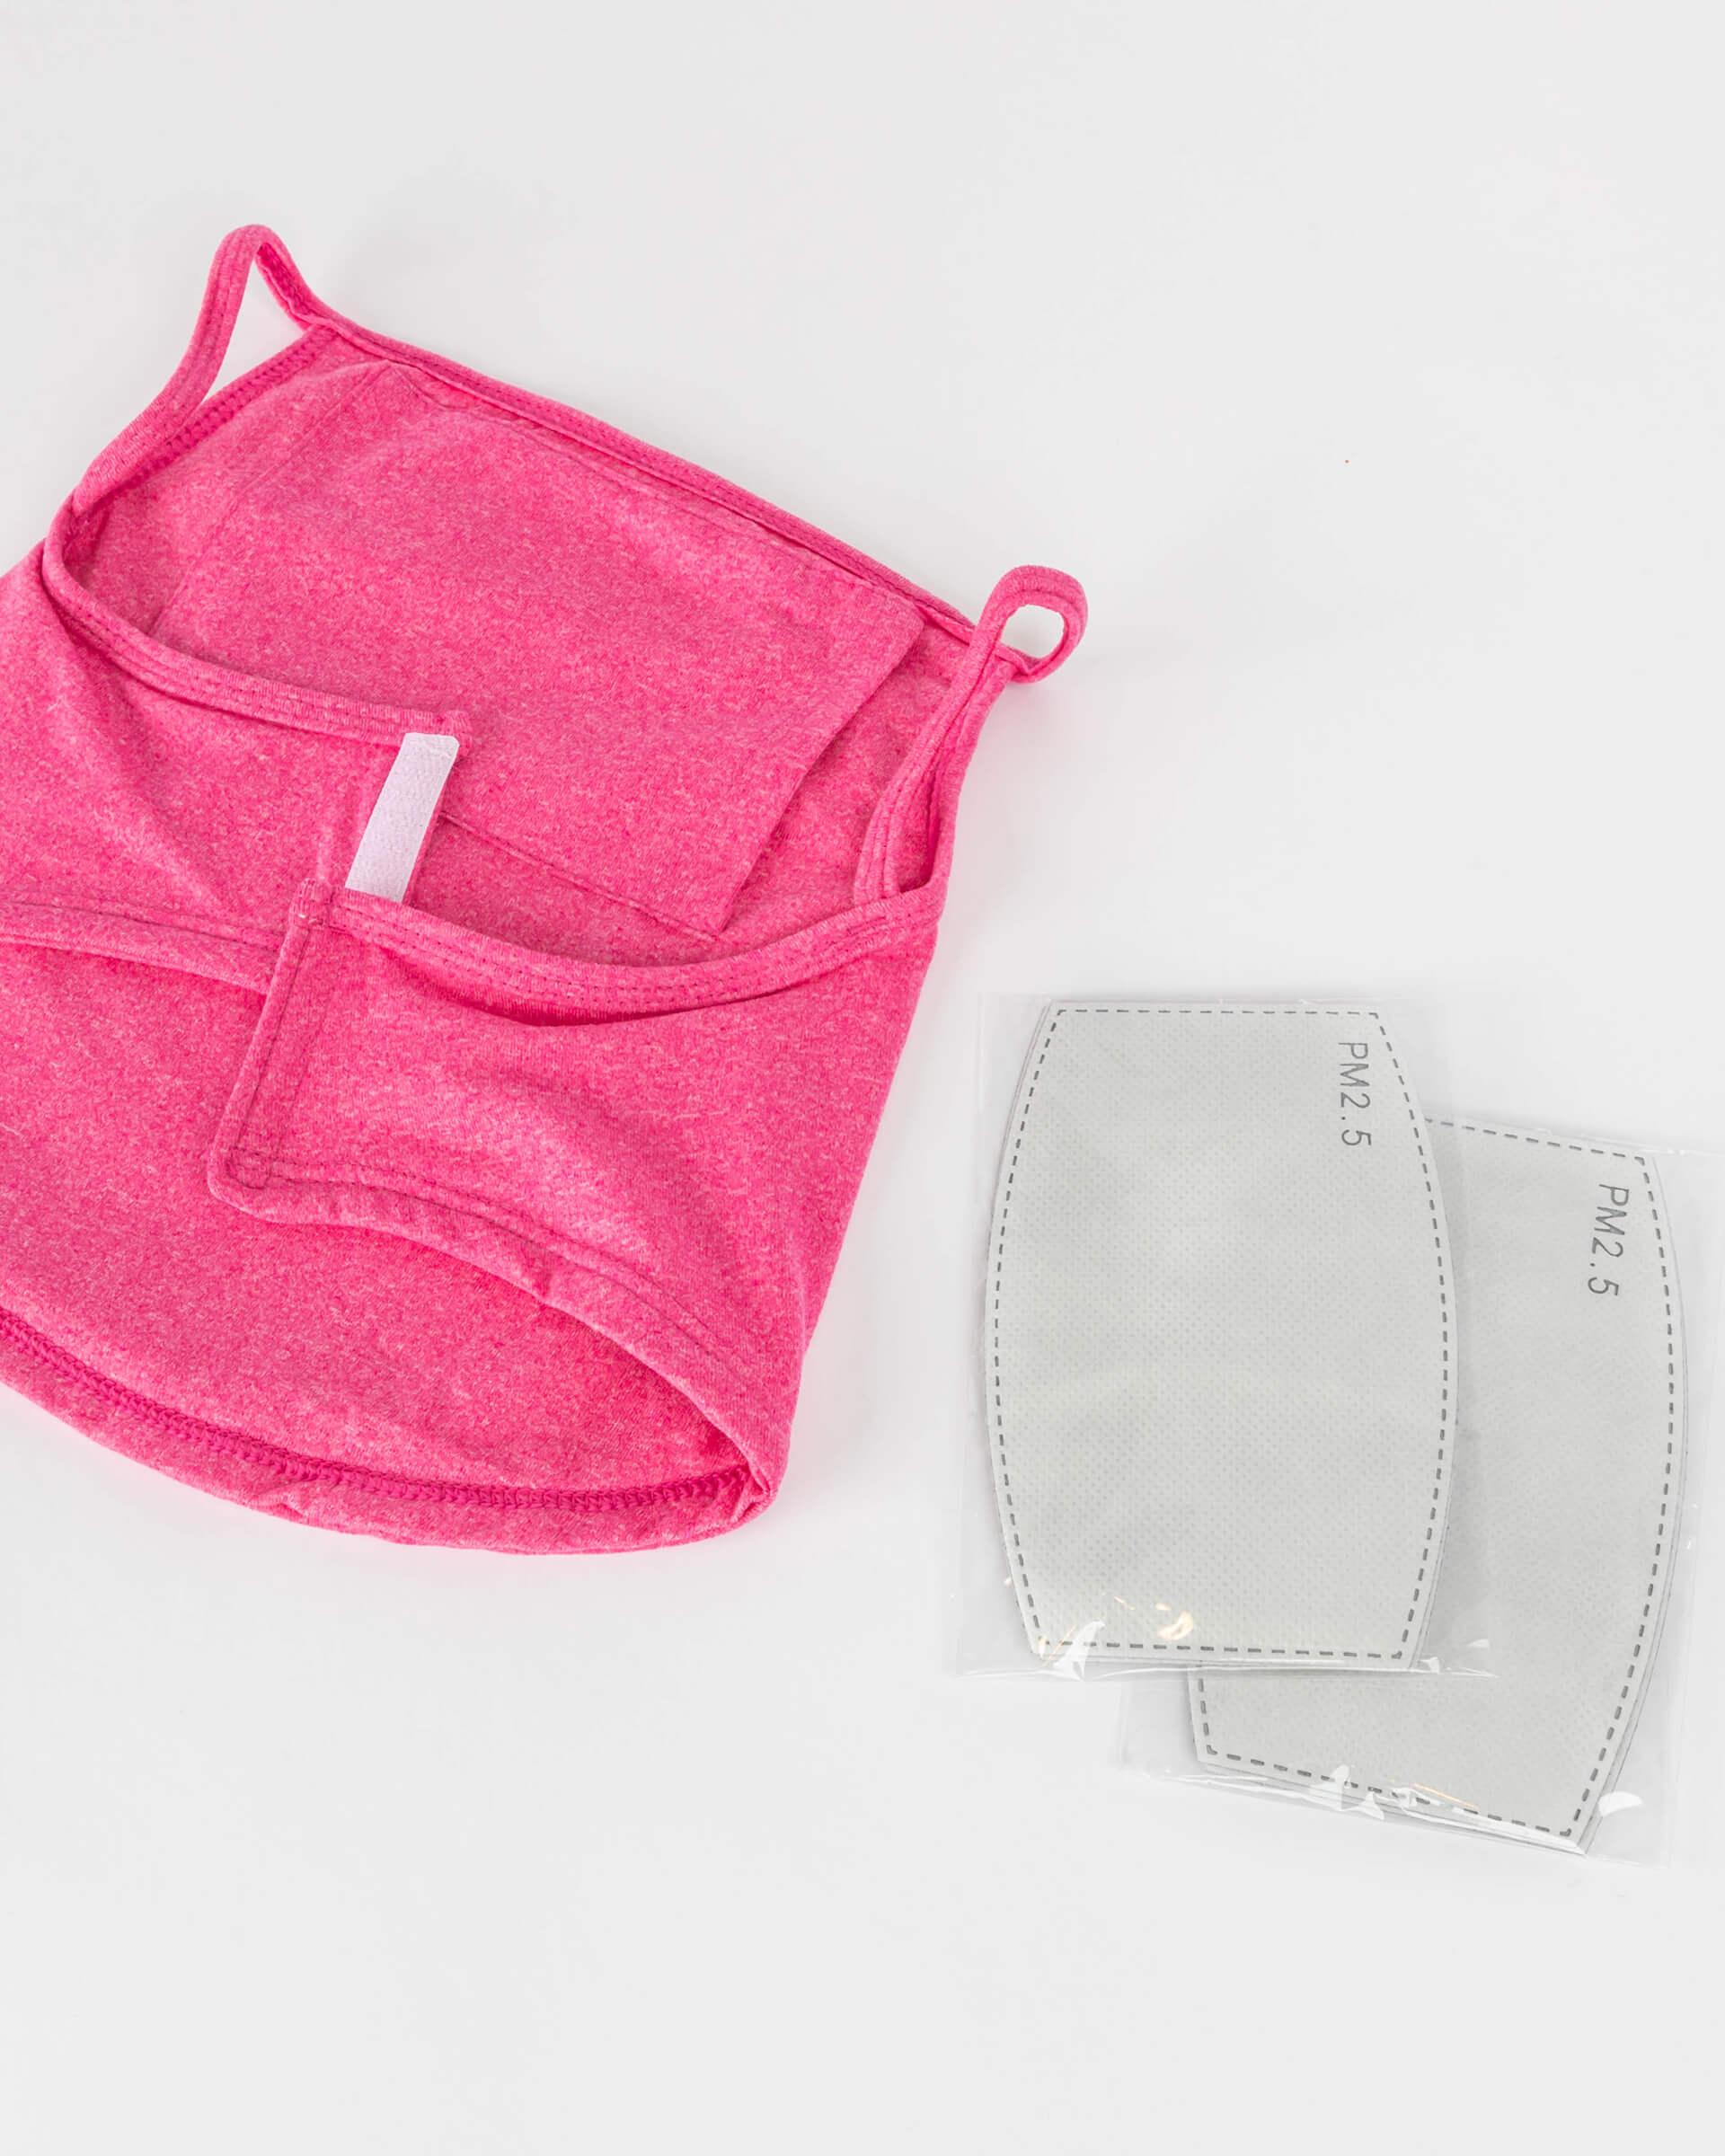 Girls' Protective Face Mask Gaiter w/ Filter Pocket - 2PC Set